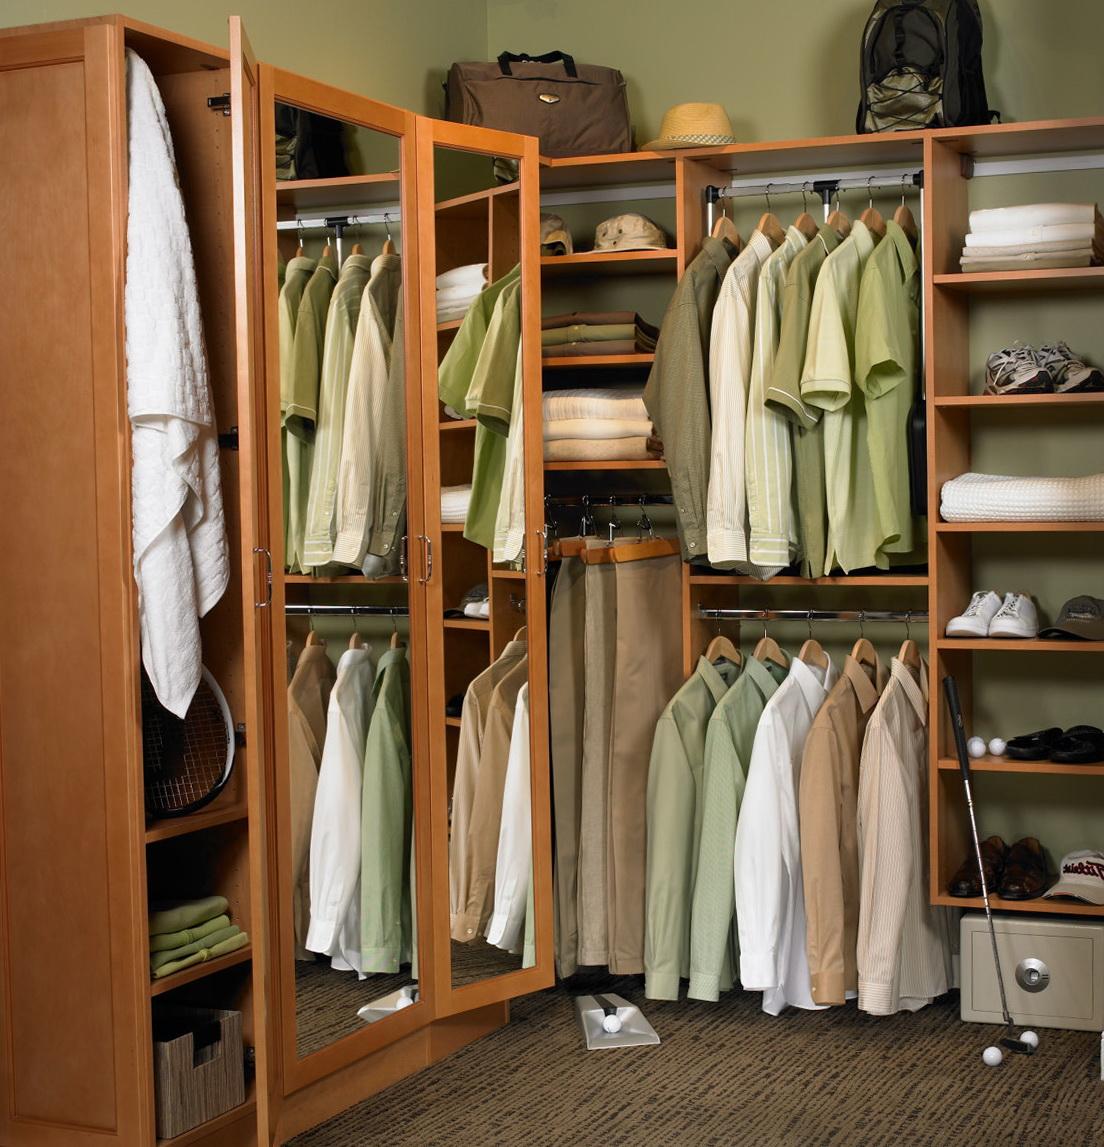 Diy Open Closet Ideas